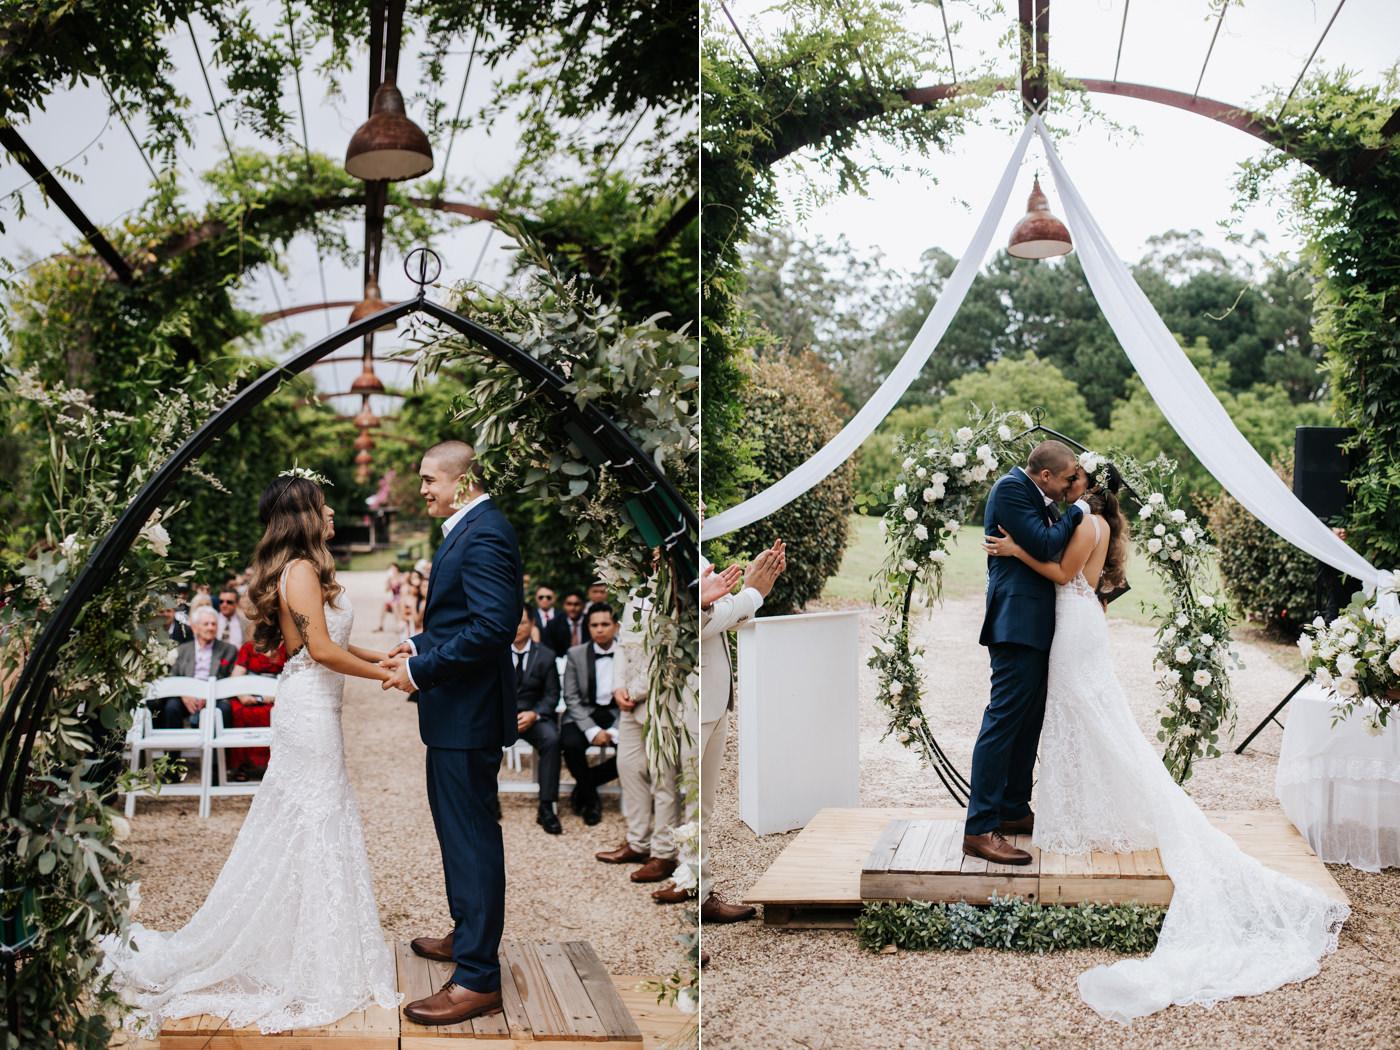 Nick & Vanezza - Fernbank Farm Wedding - Samantha Heather Photography-72.jpg